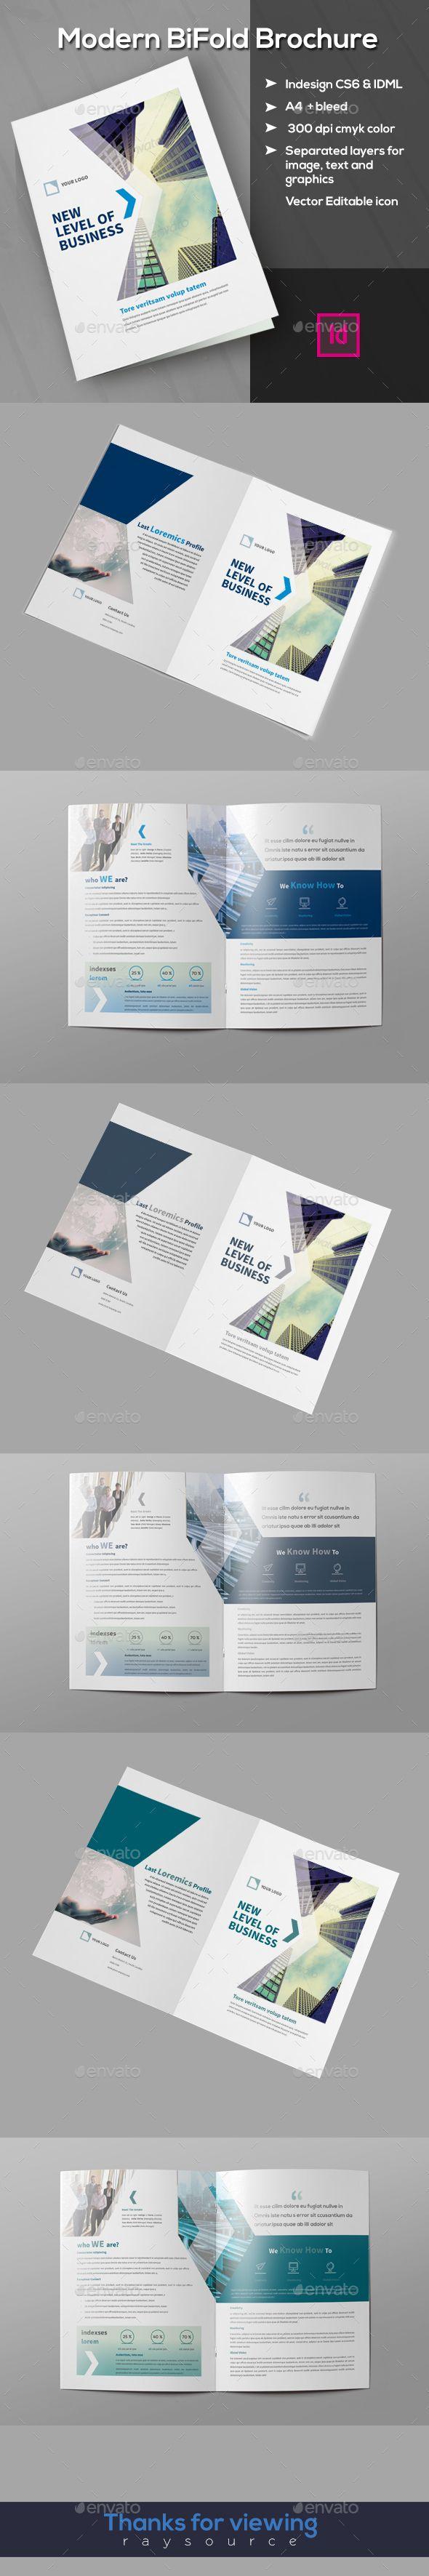 56 best images about Brochure Design on Pinterest | Creative ...